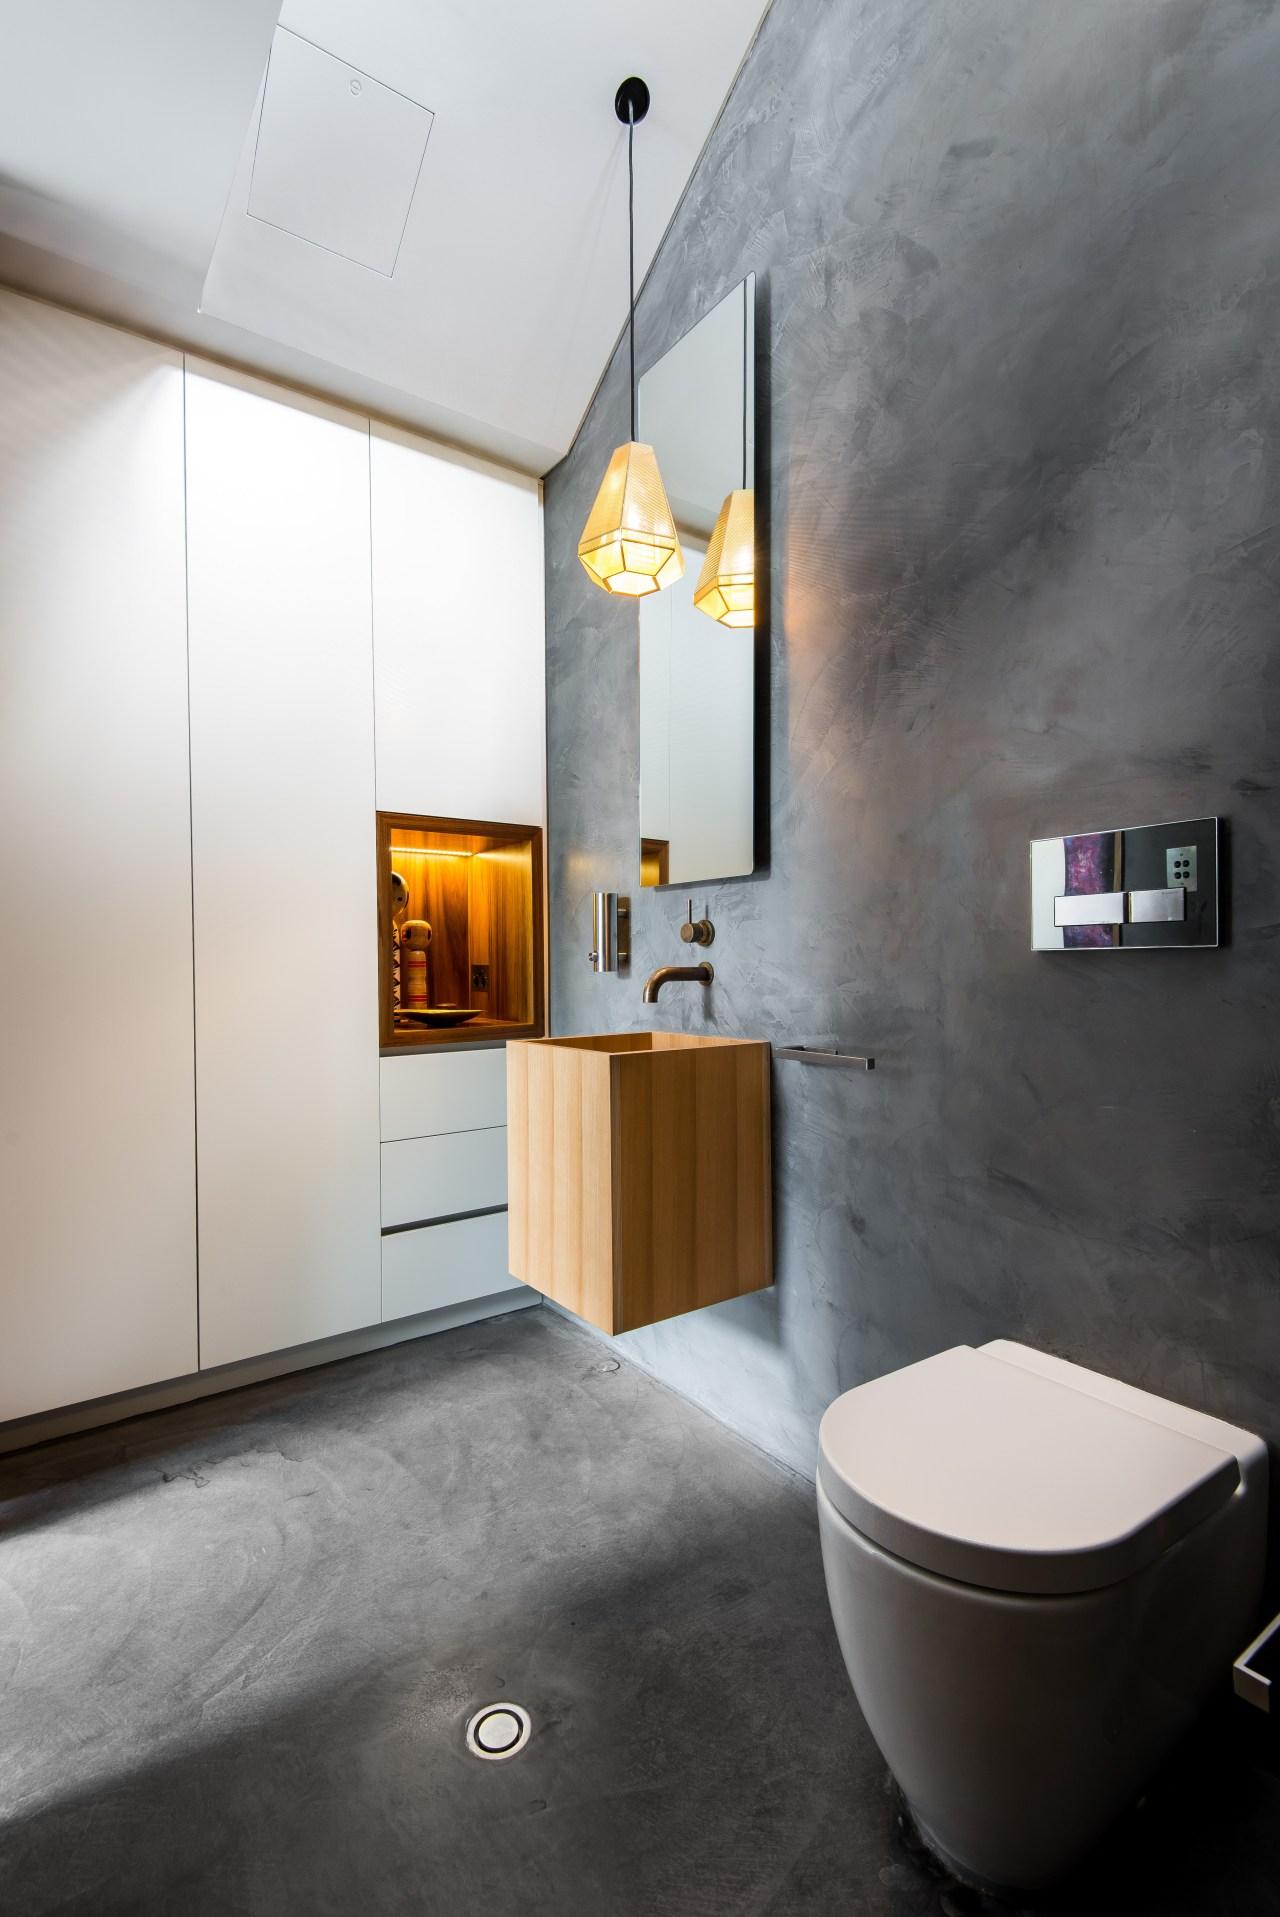 A wall niche in Tasmanian blackwood is in architecture, bathroom, floor, interior design, plumbing fixture, product design, room, sink, tap, wall, gray, black